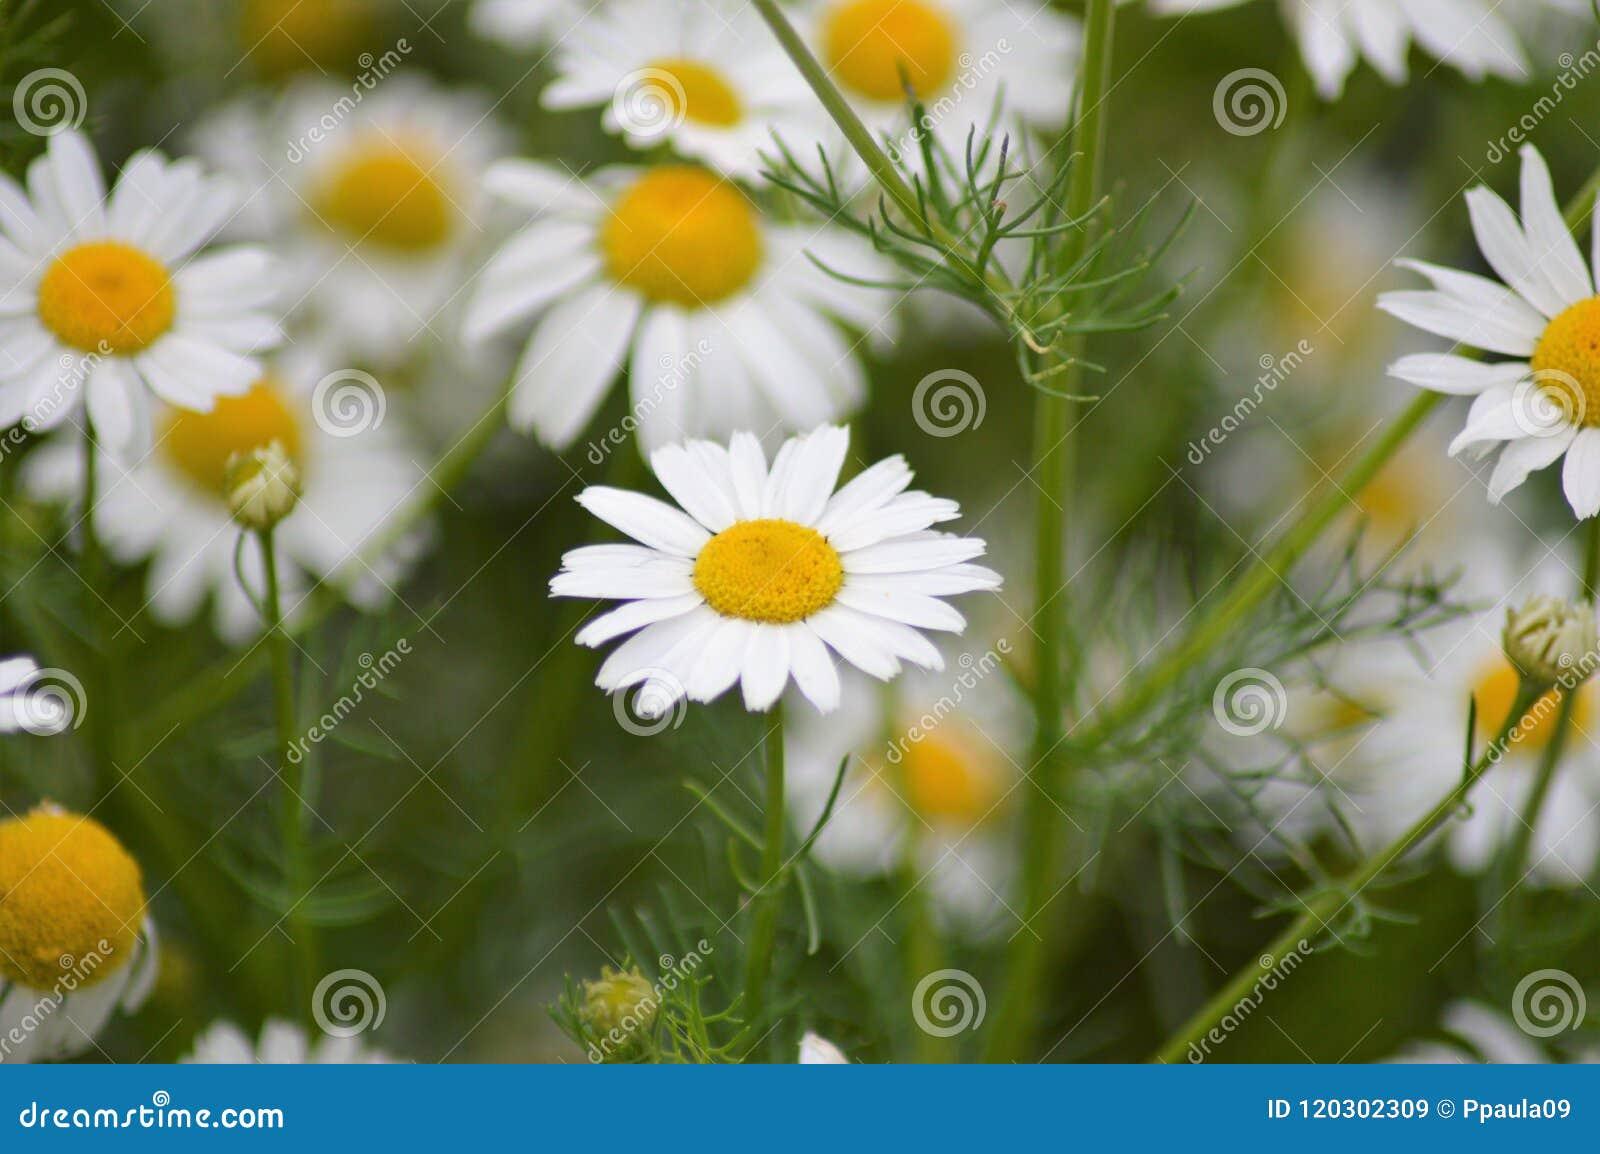 The wild daisy flower on the field stock image image of archetypal the wild daisy flower on the field izmirmasajfo